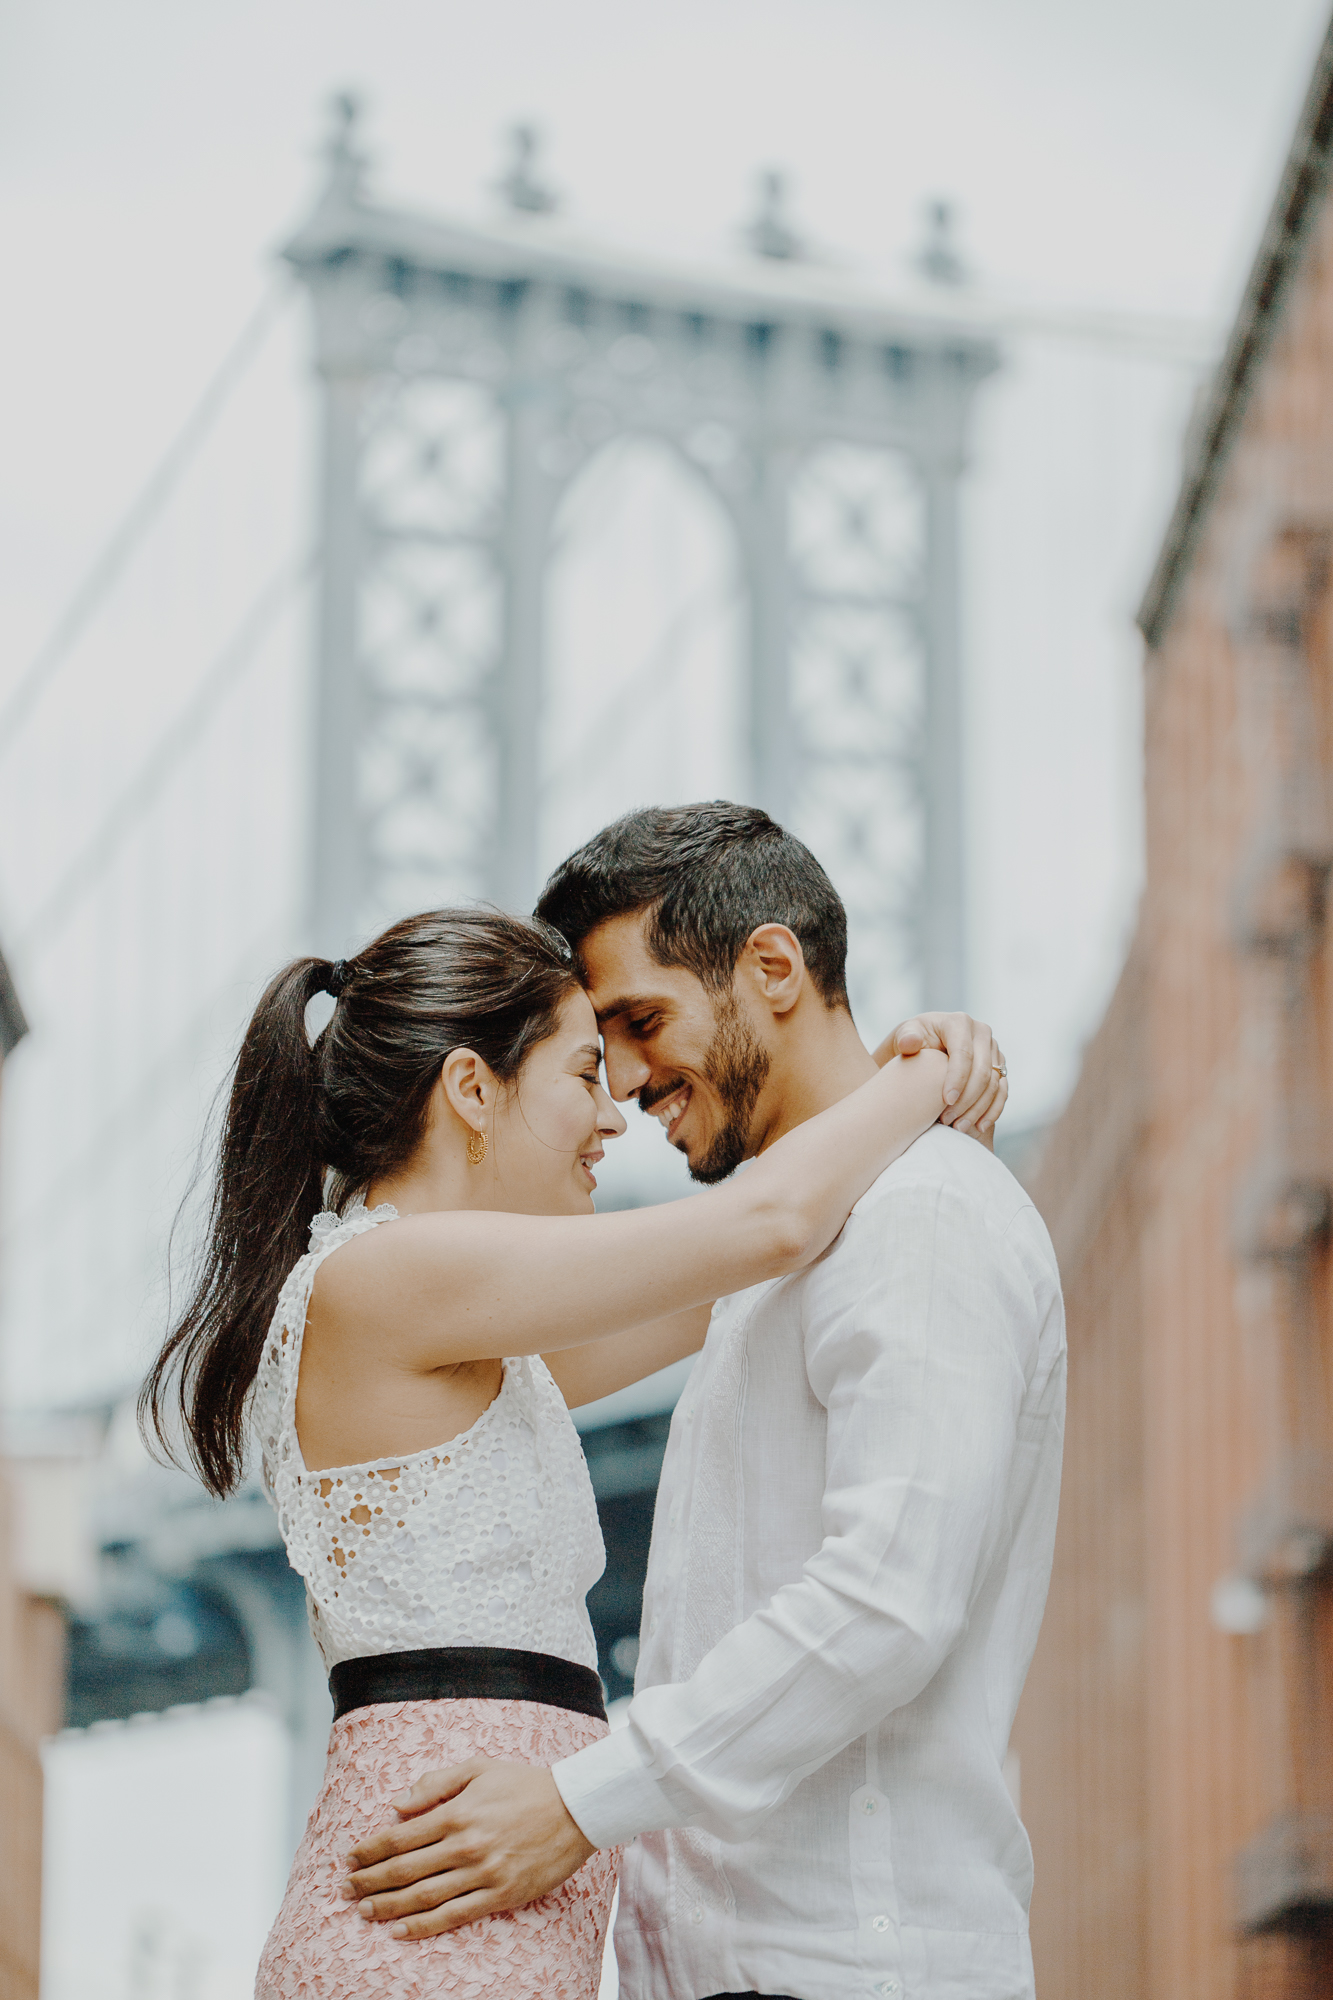 Brooklyn bridge engagement photos